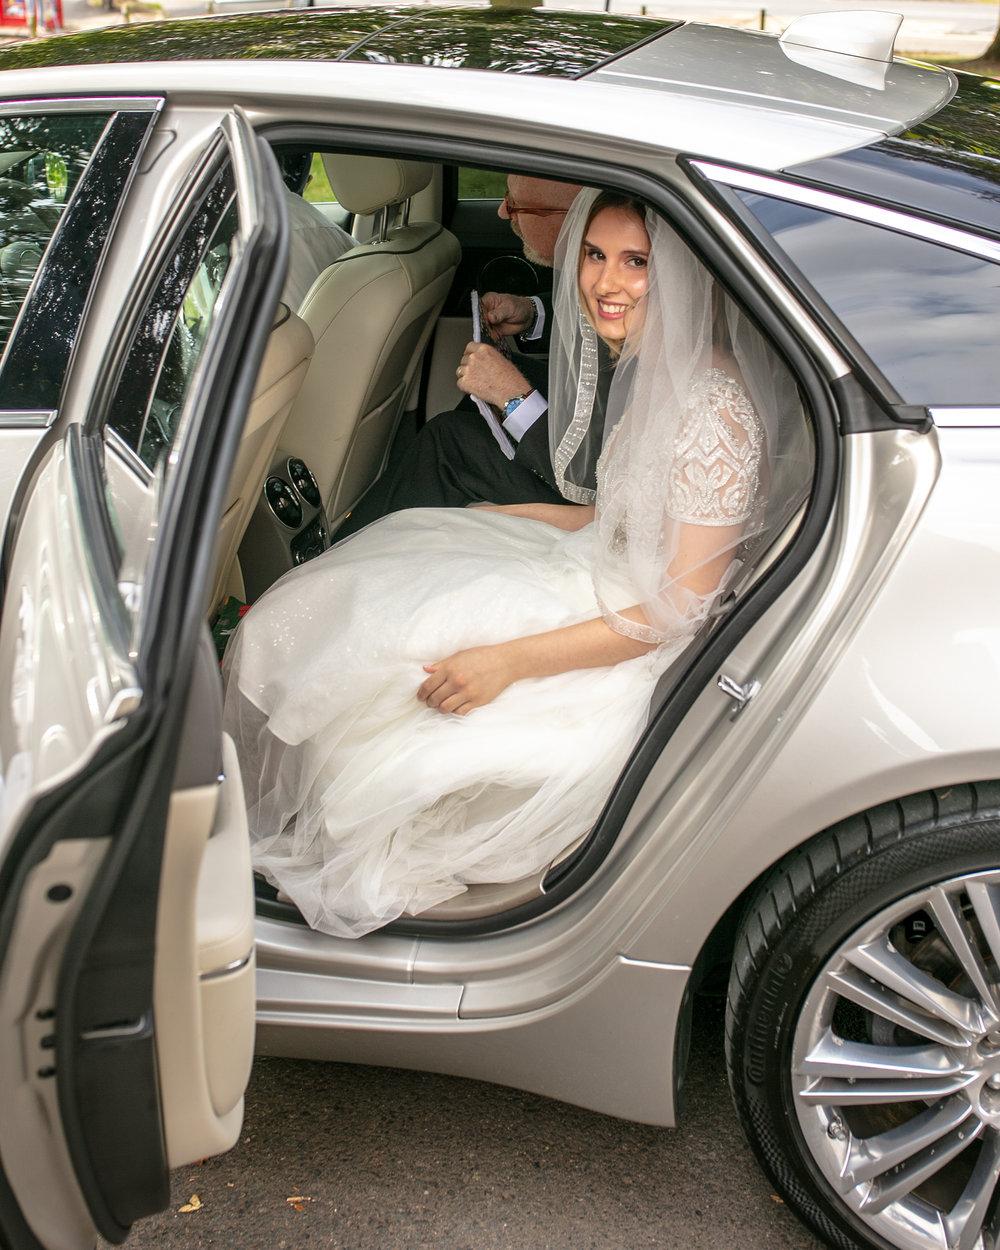 Charringworth-Manor-Wedding-Photography01.jpg